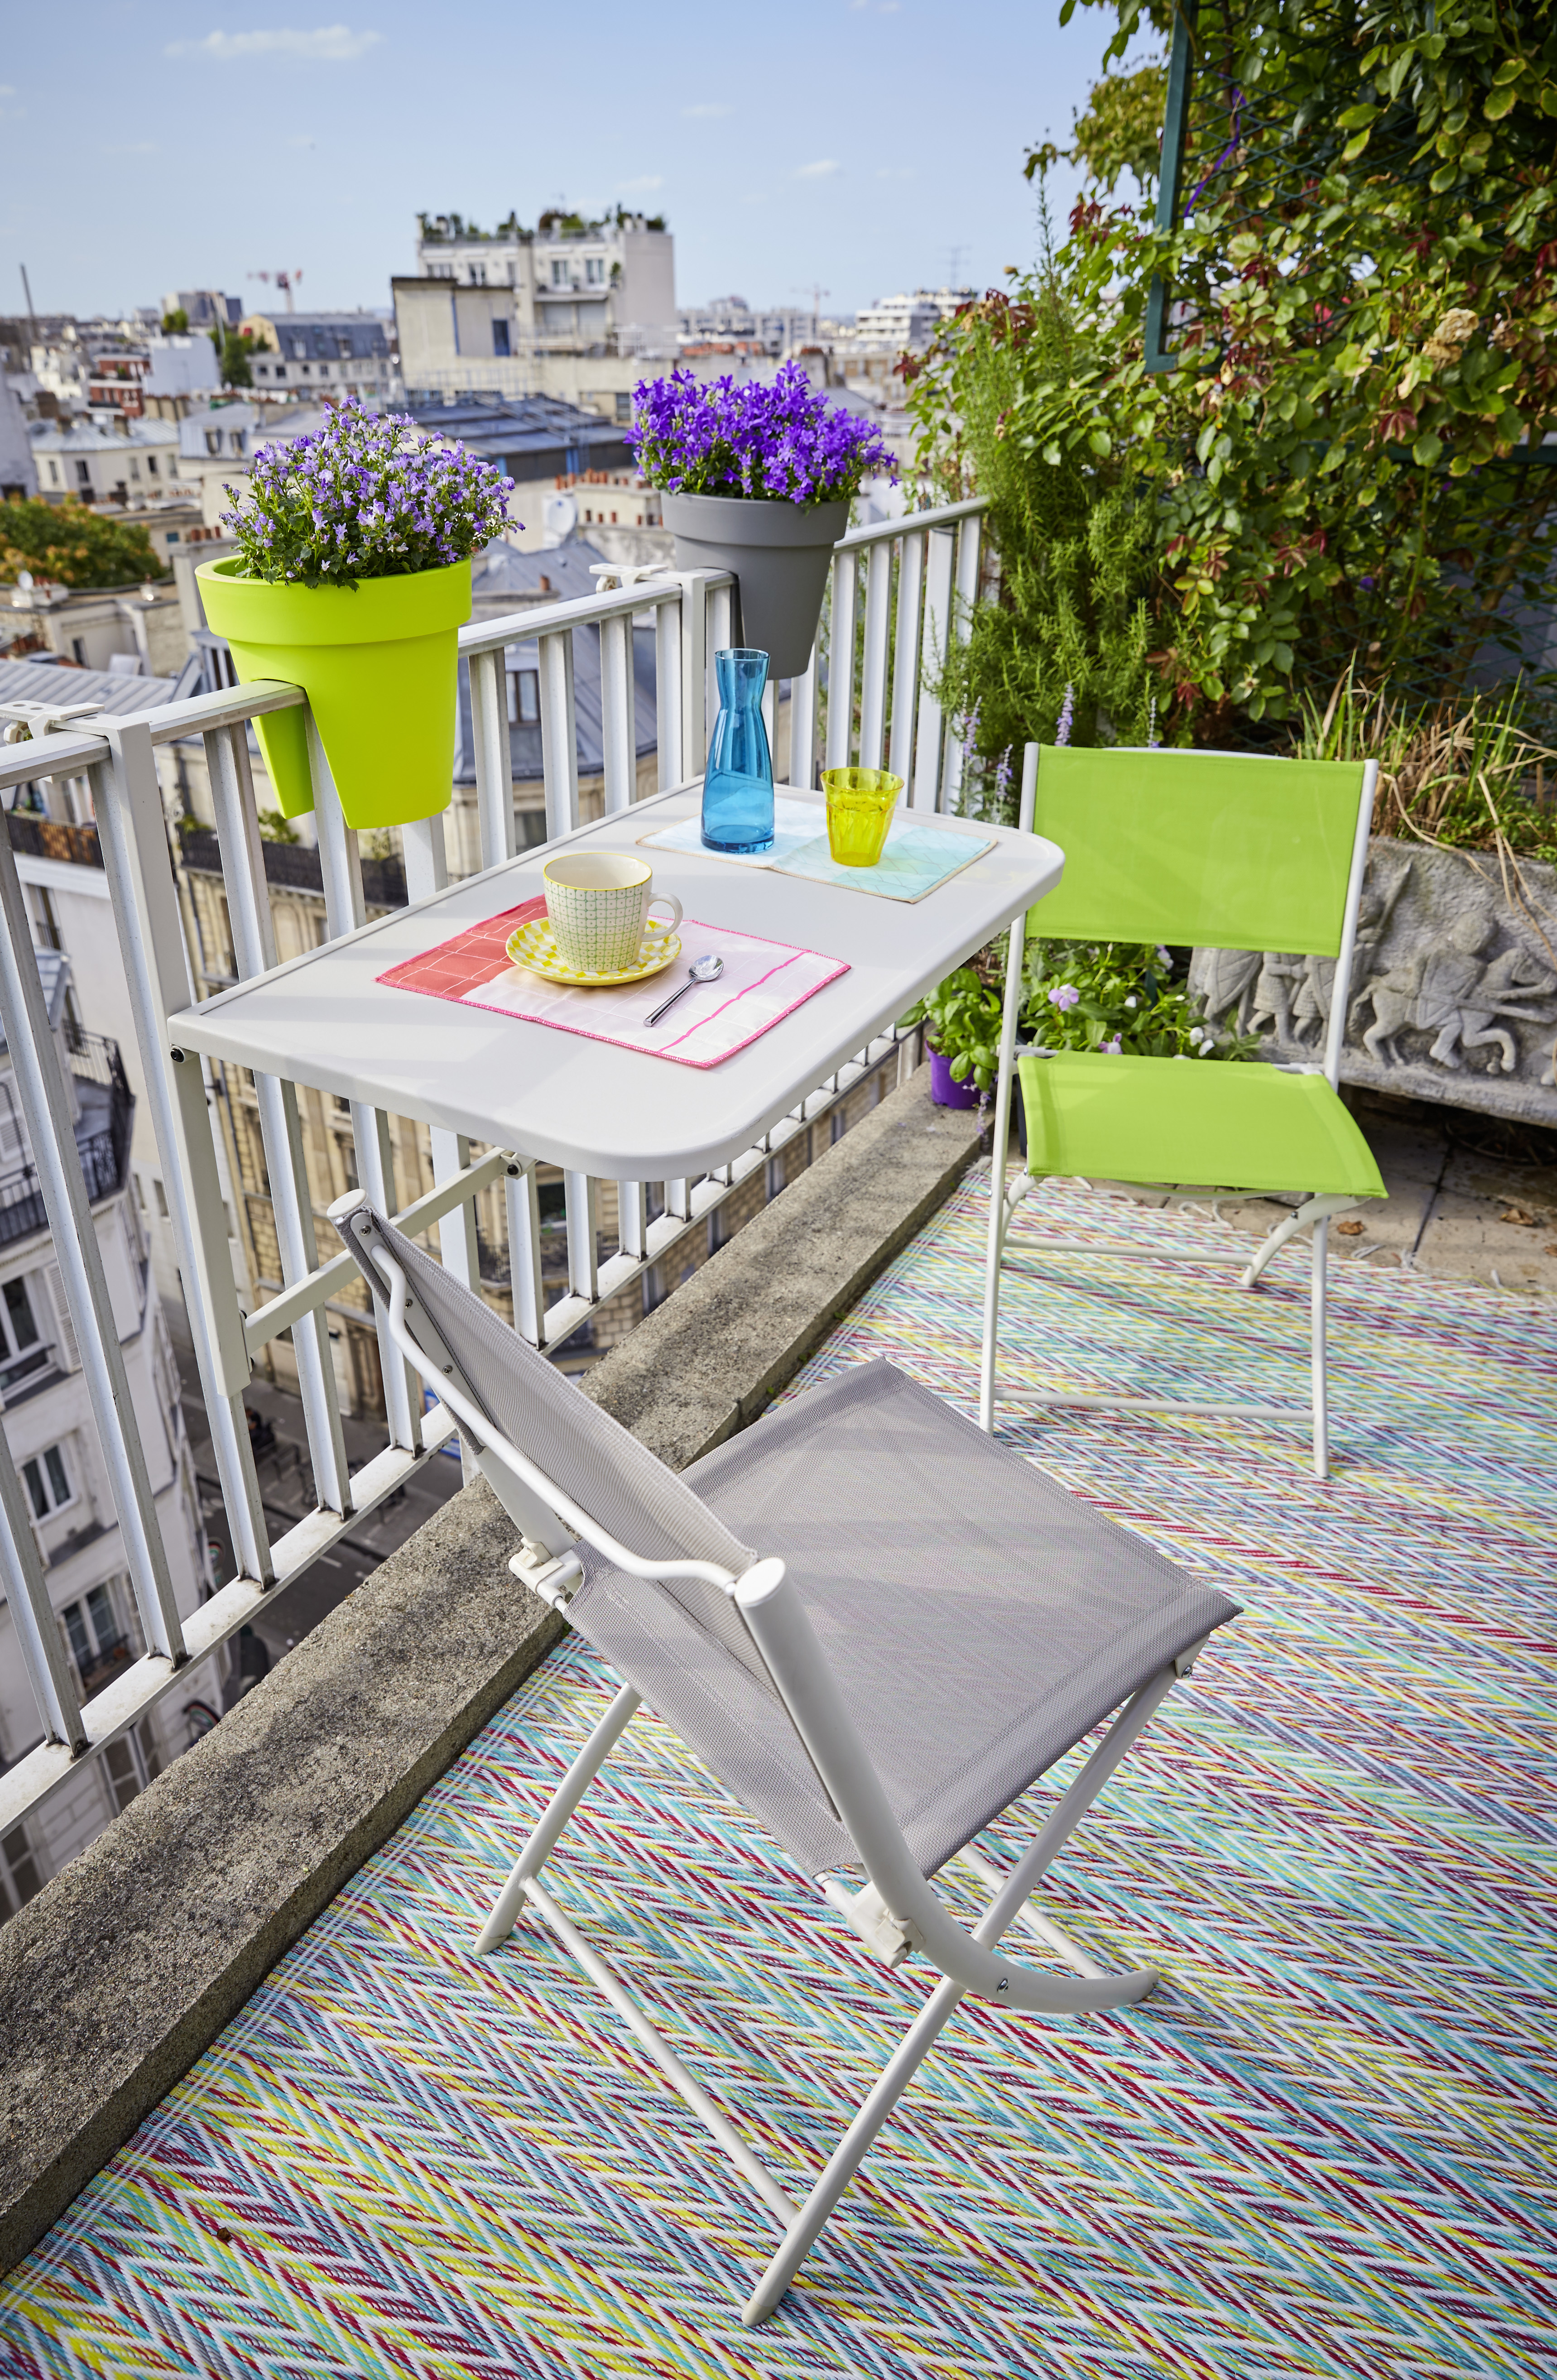 Carrefour table balcon accrocher 16s7361b gris 65cm x 92cm x 64cm pas cher achat - Table a accrocher au balcon ...